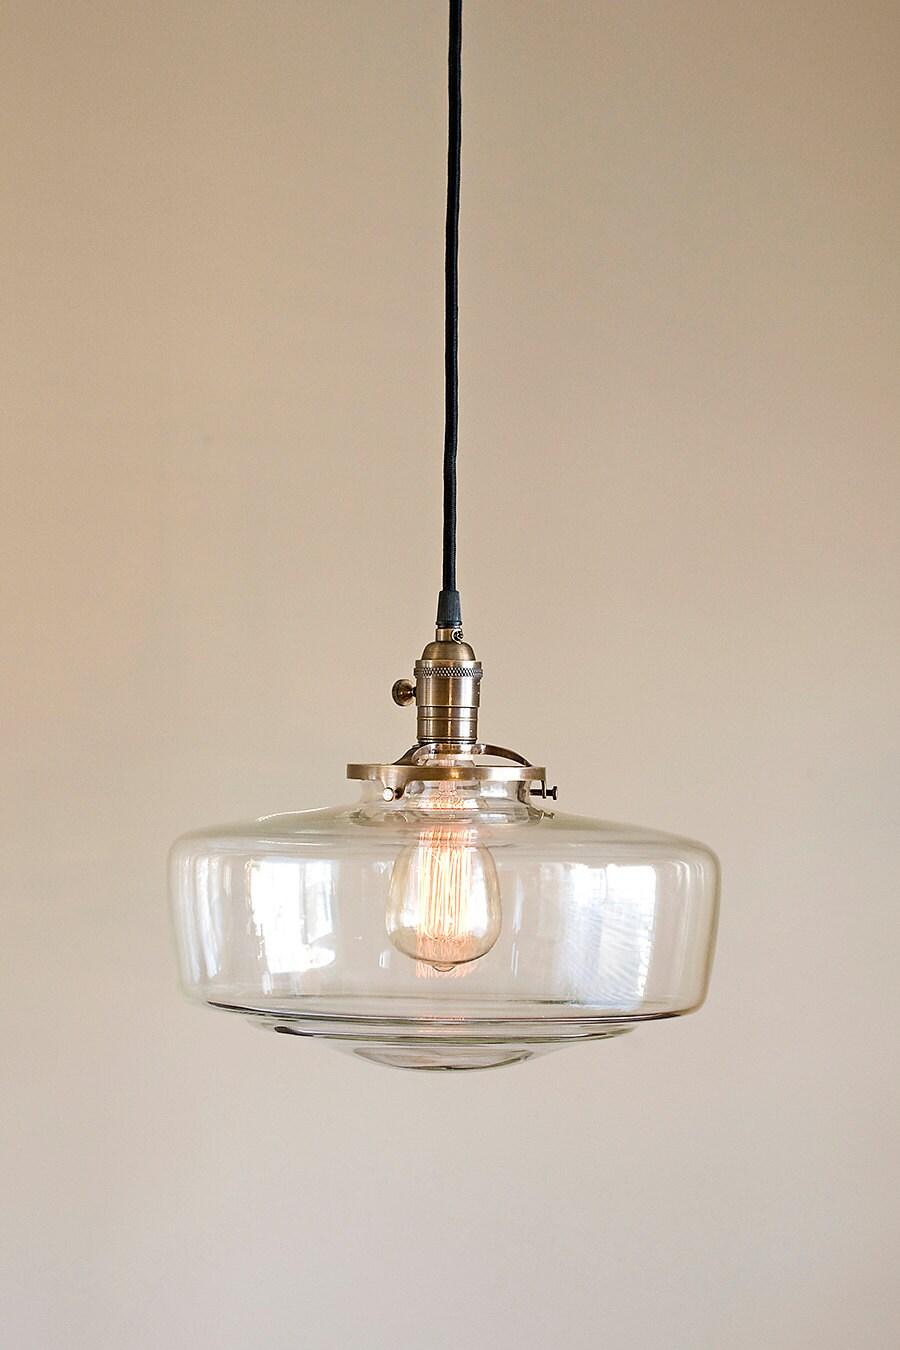 glass schoolhouse light fixture pendant